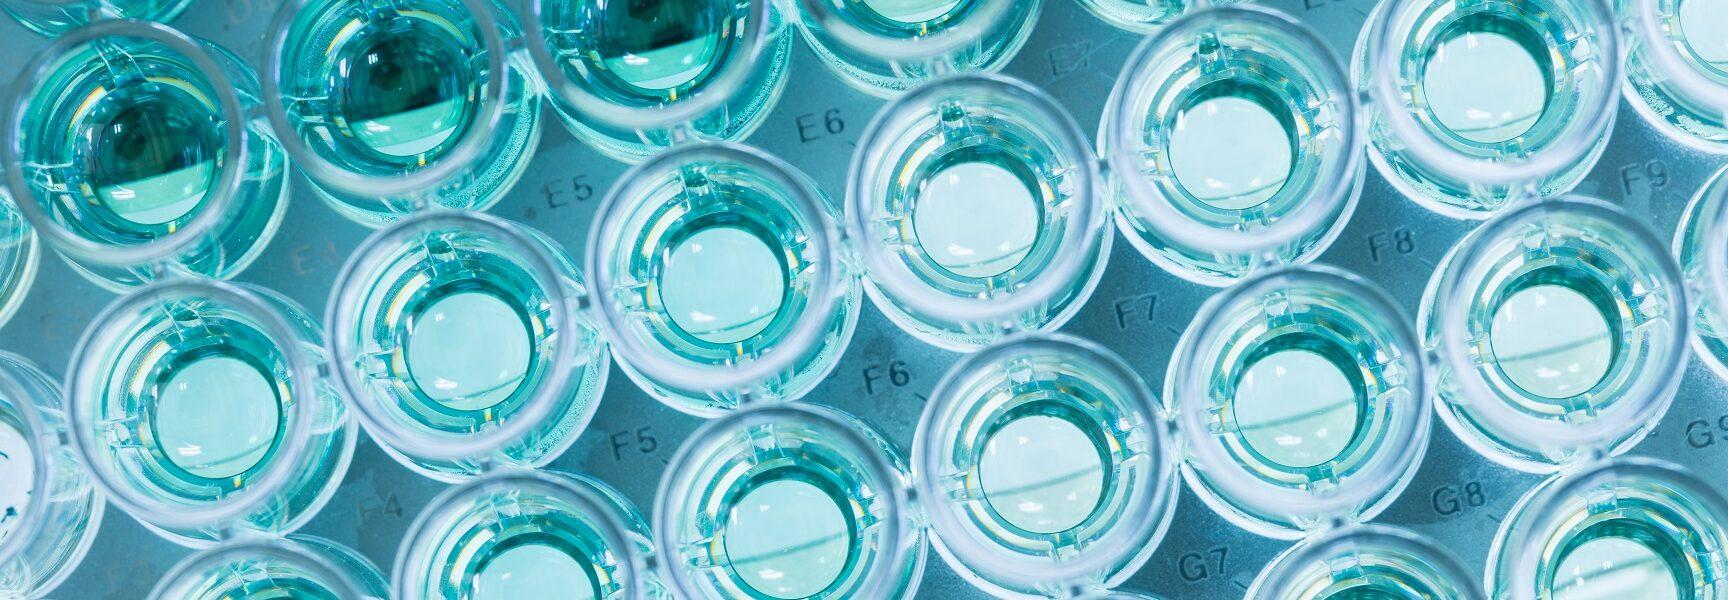 Luminescent bacteria test_ISO 11348-3